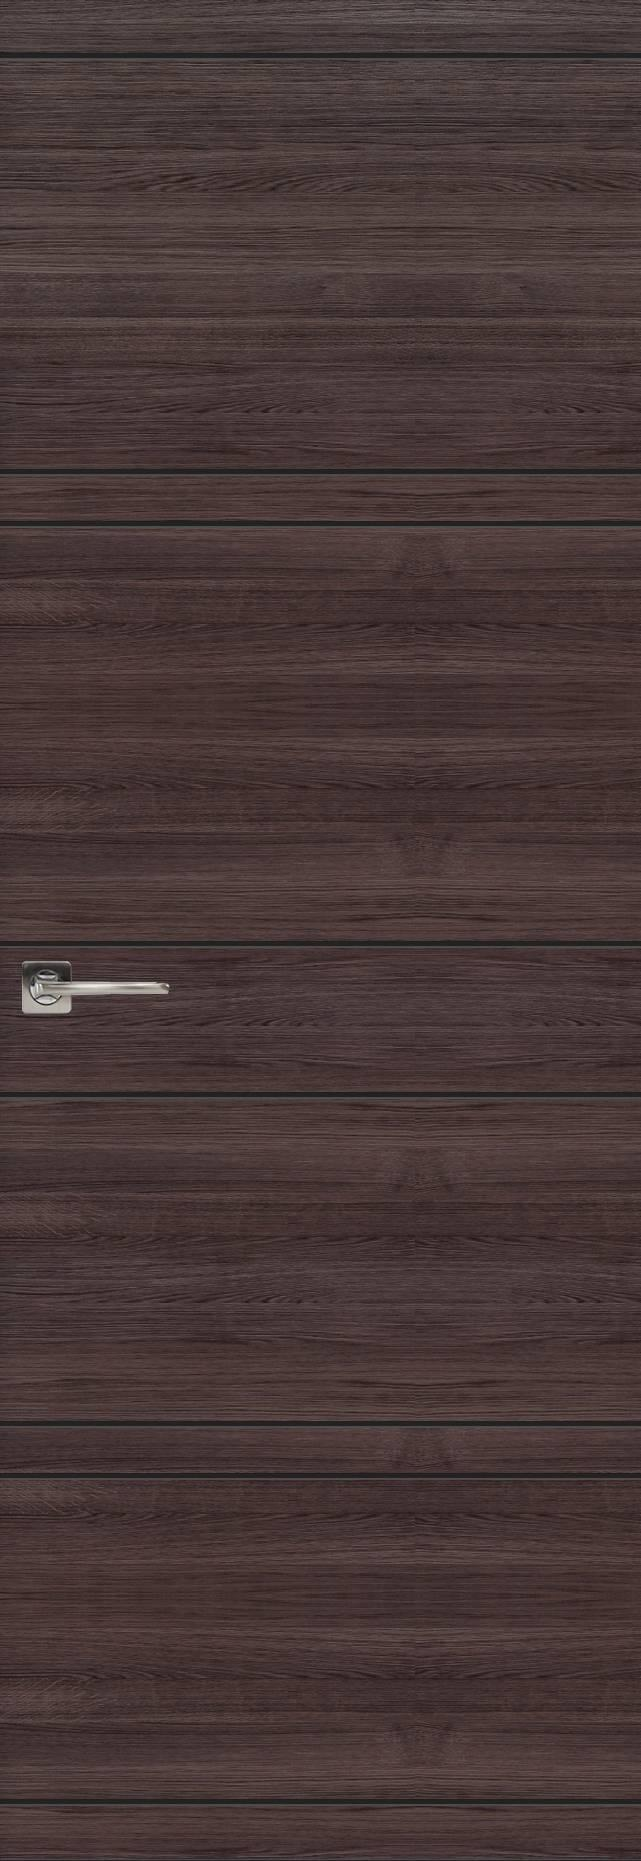 Tivoli Е-2 Invisible цвет - Венге Нуар Без стекла (ДГ)